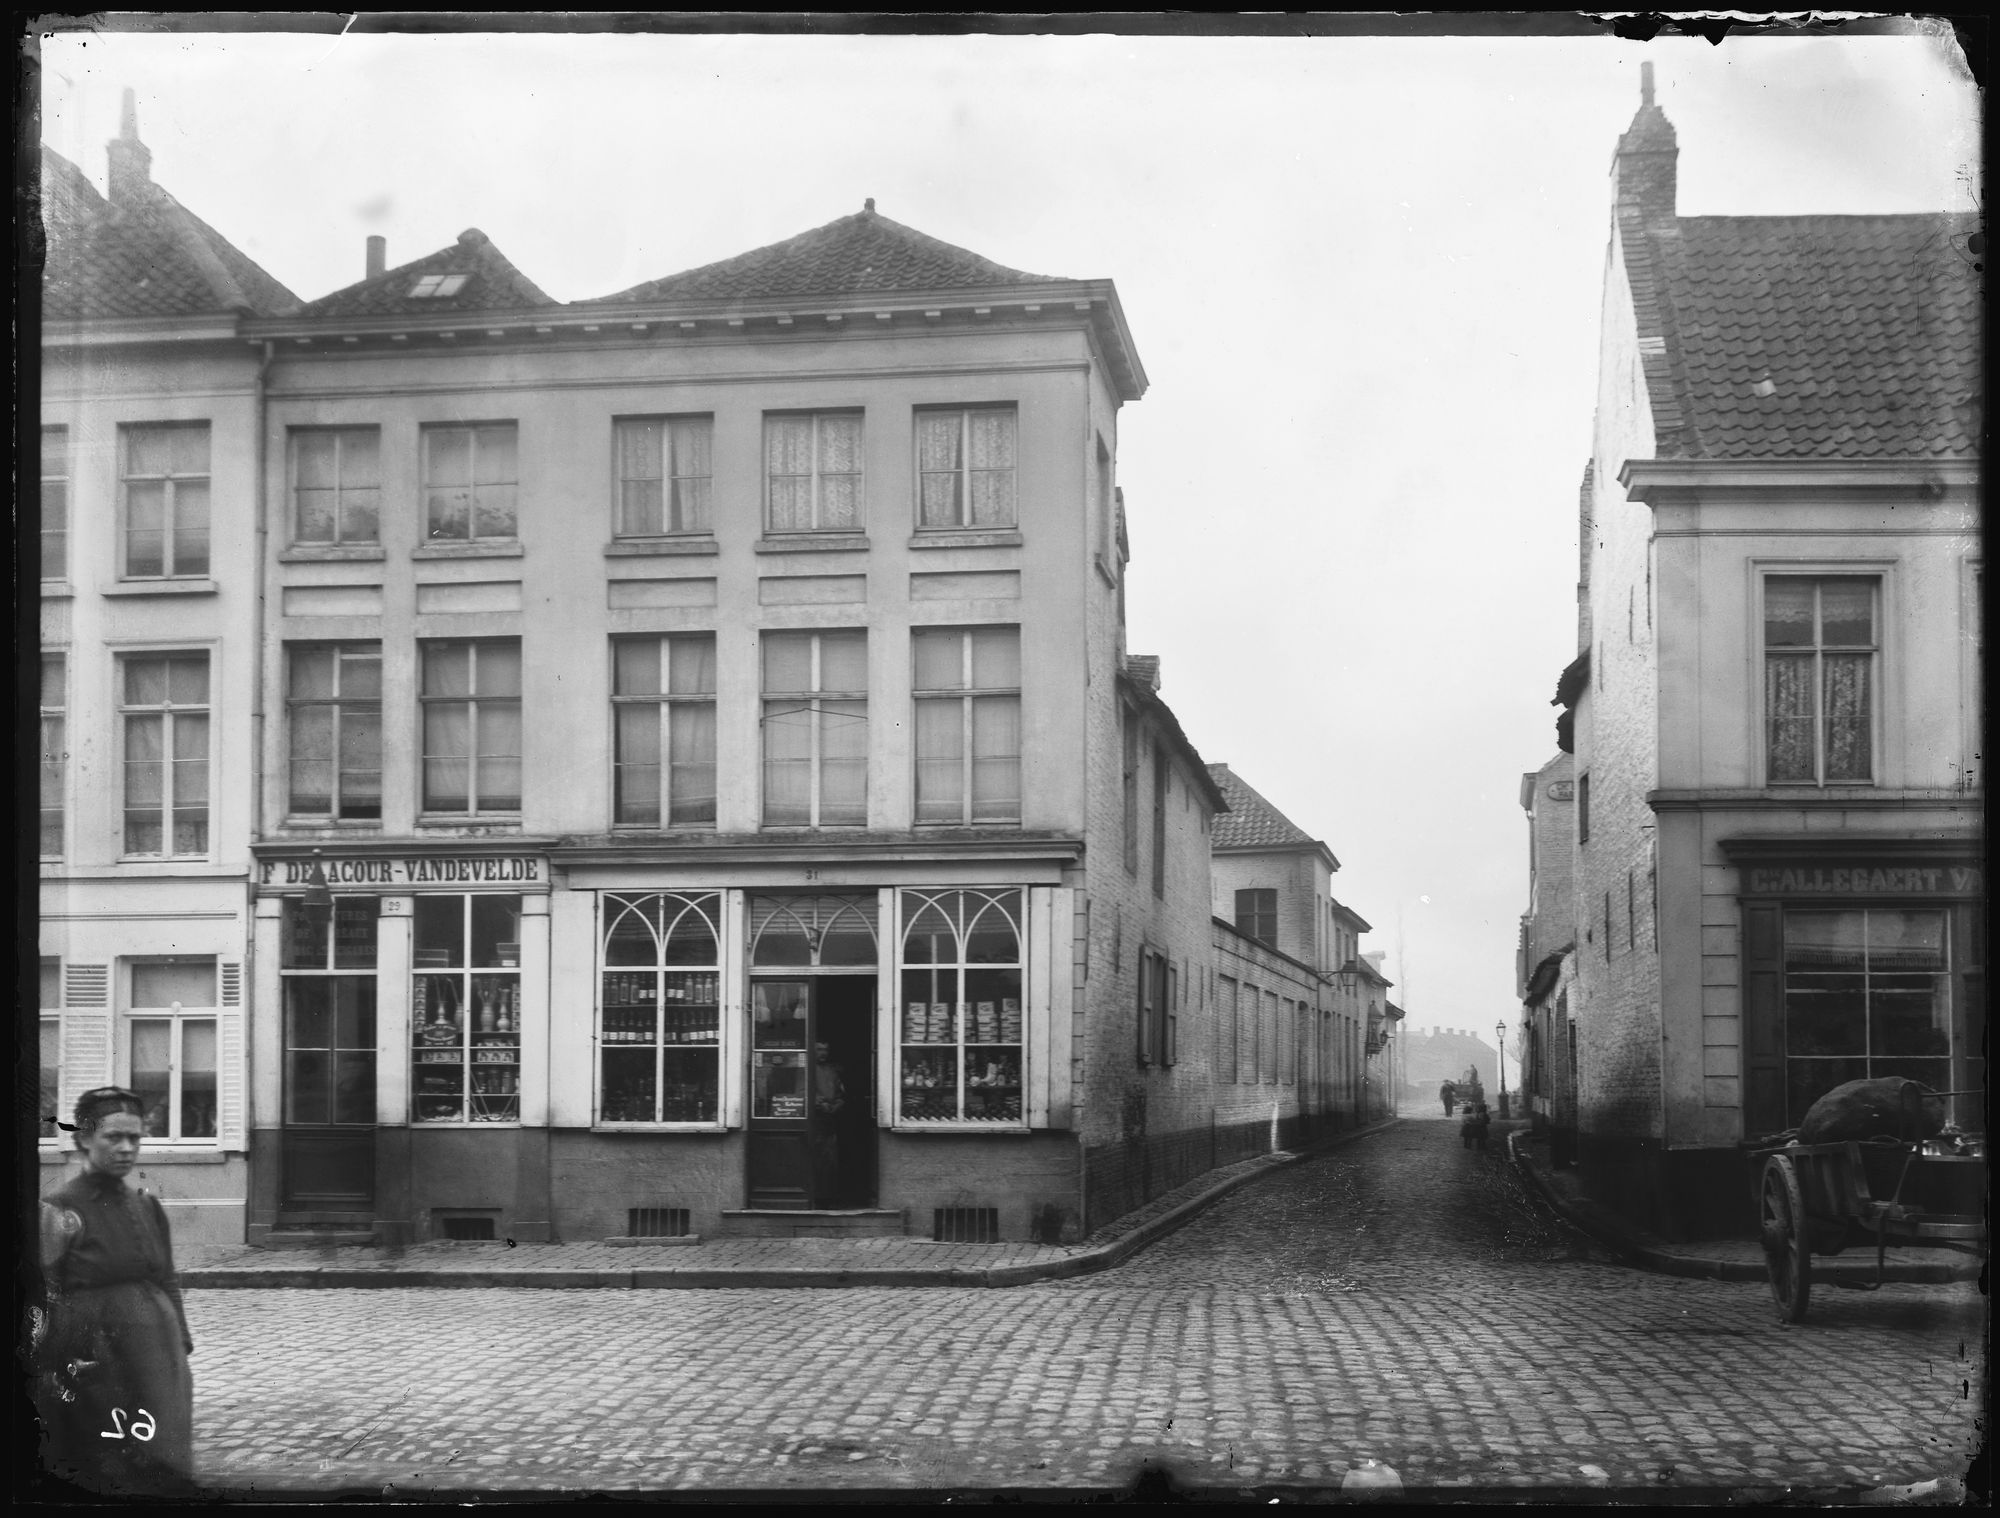 Overleiestraat circa 1895